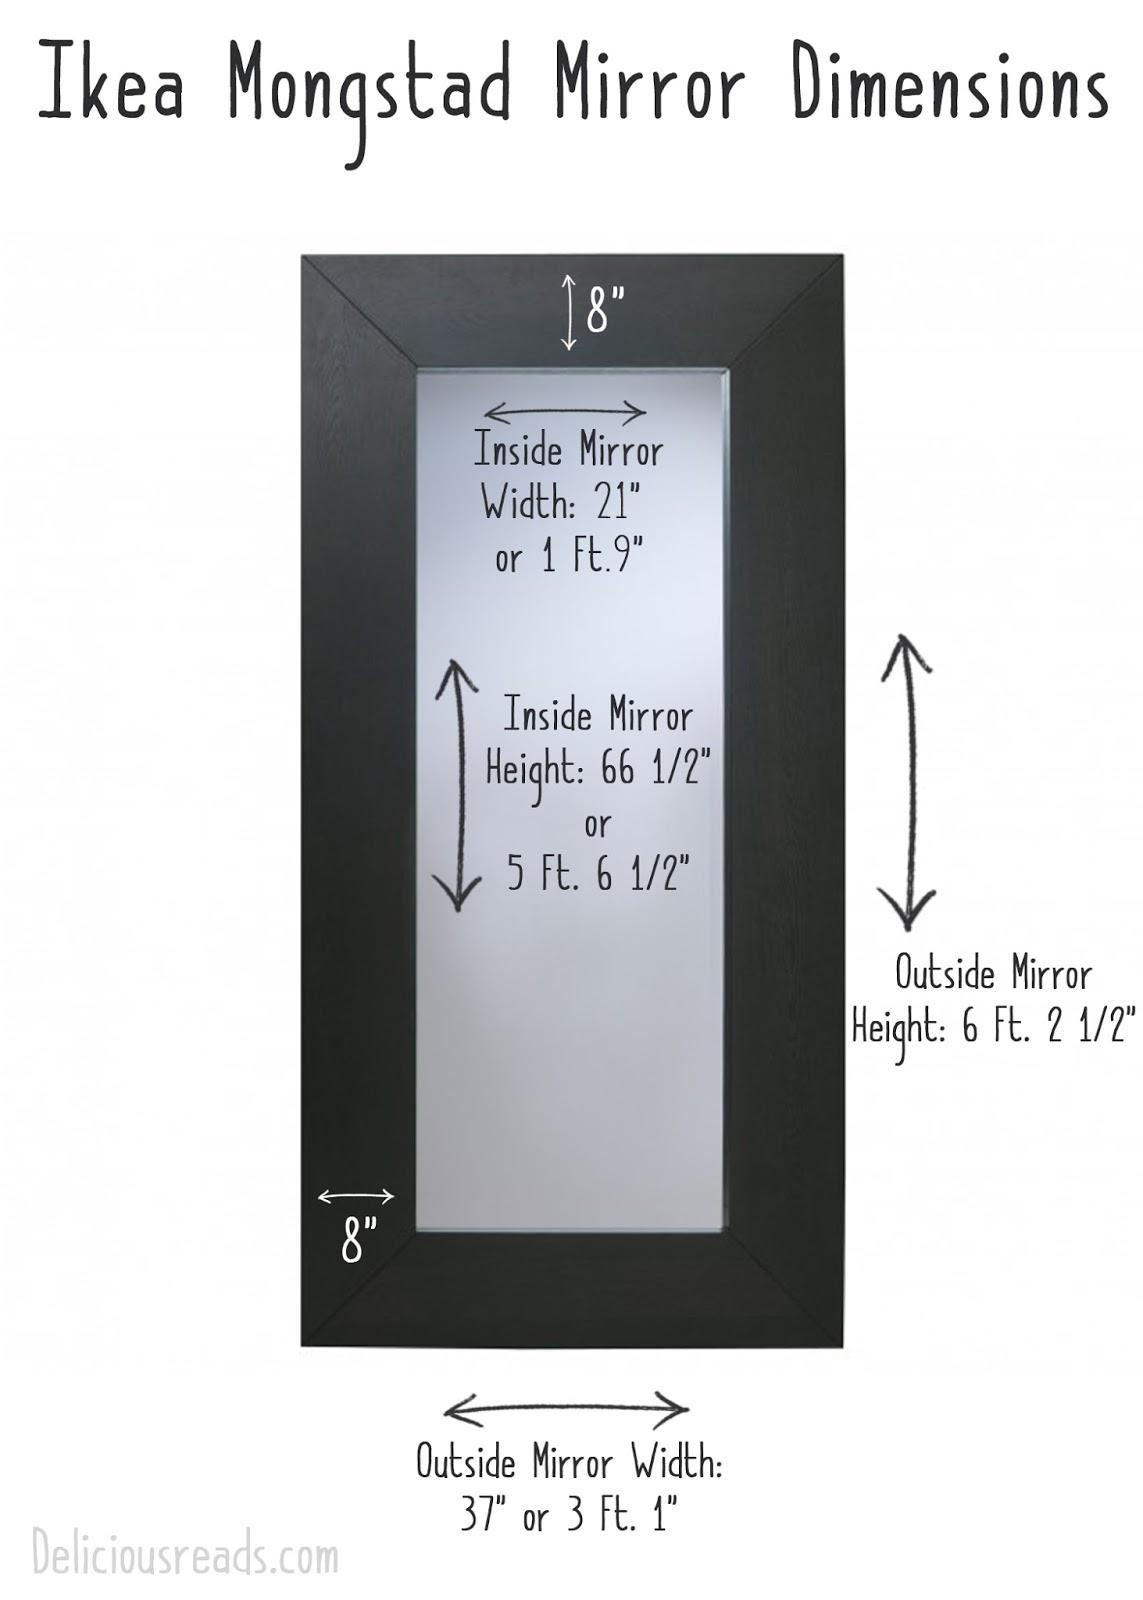 Ikea Mongstad Mirror Delicious Reads Diy Harry Potter Cardboard Mirror Of Erised